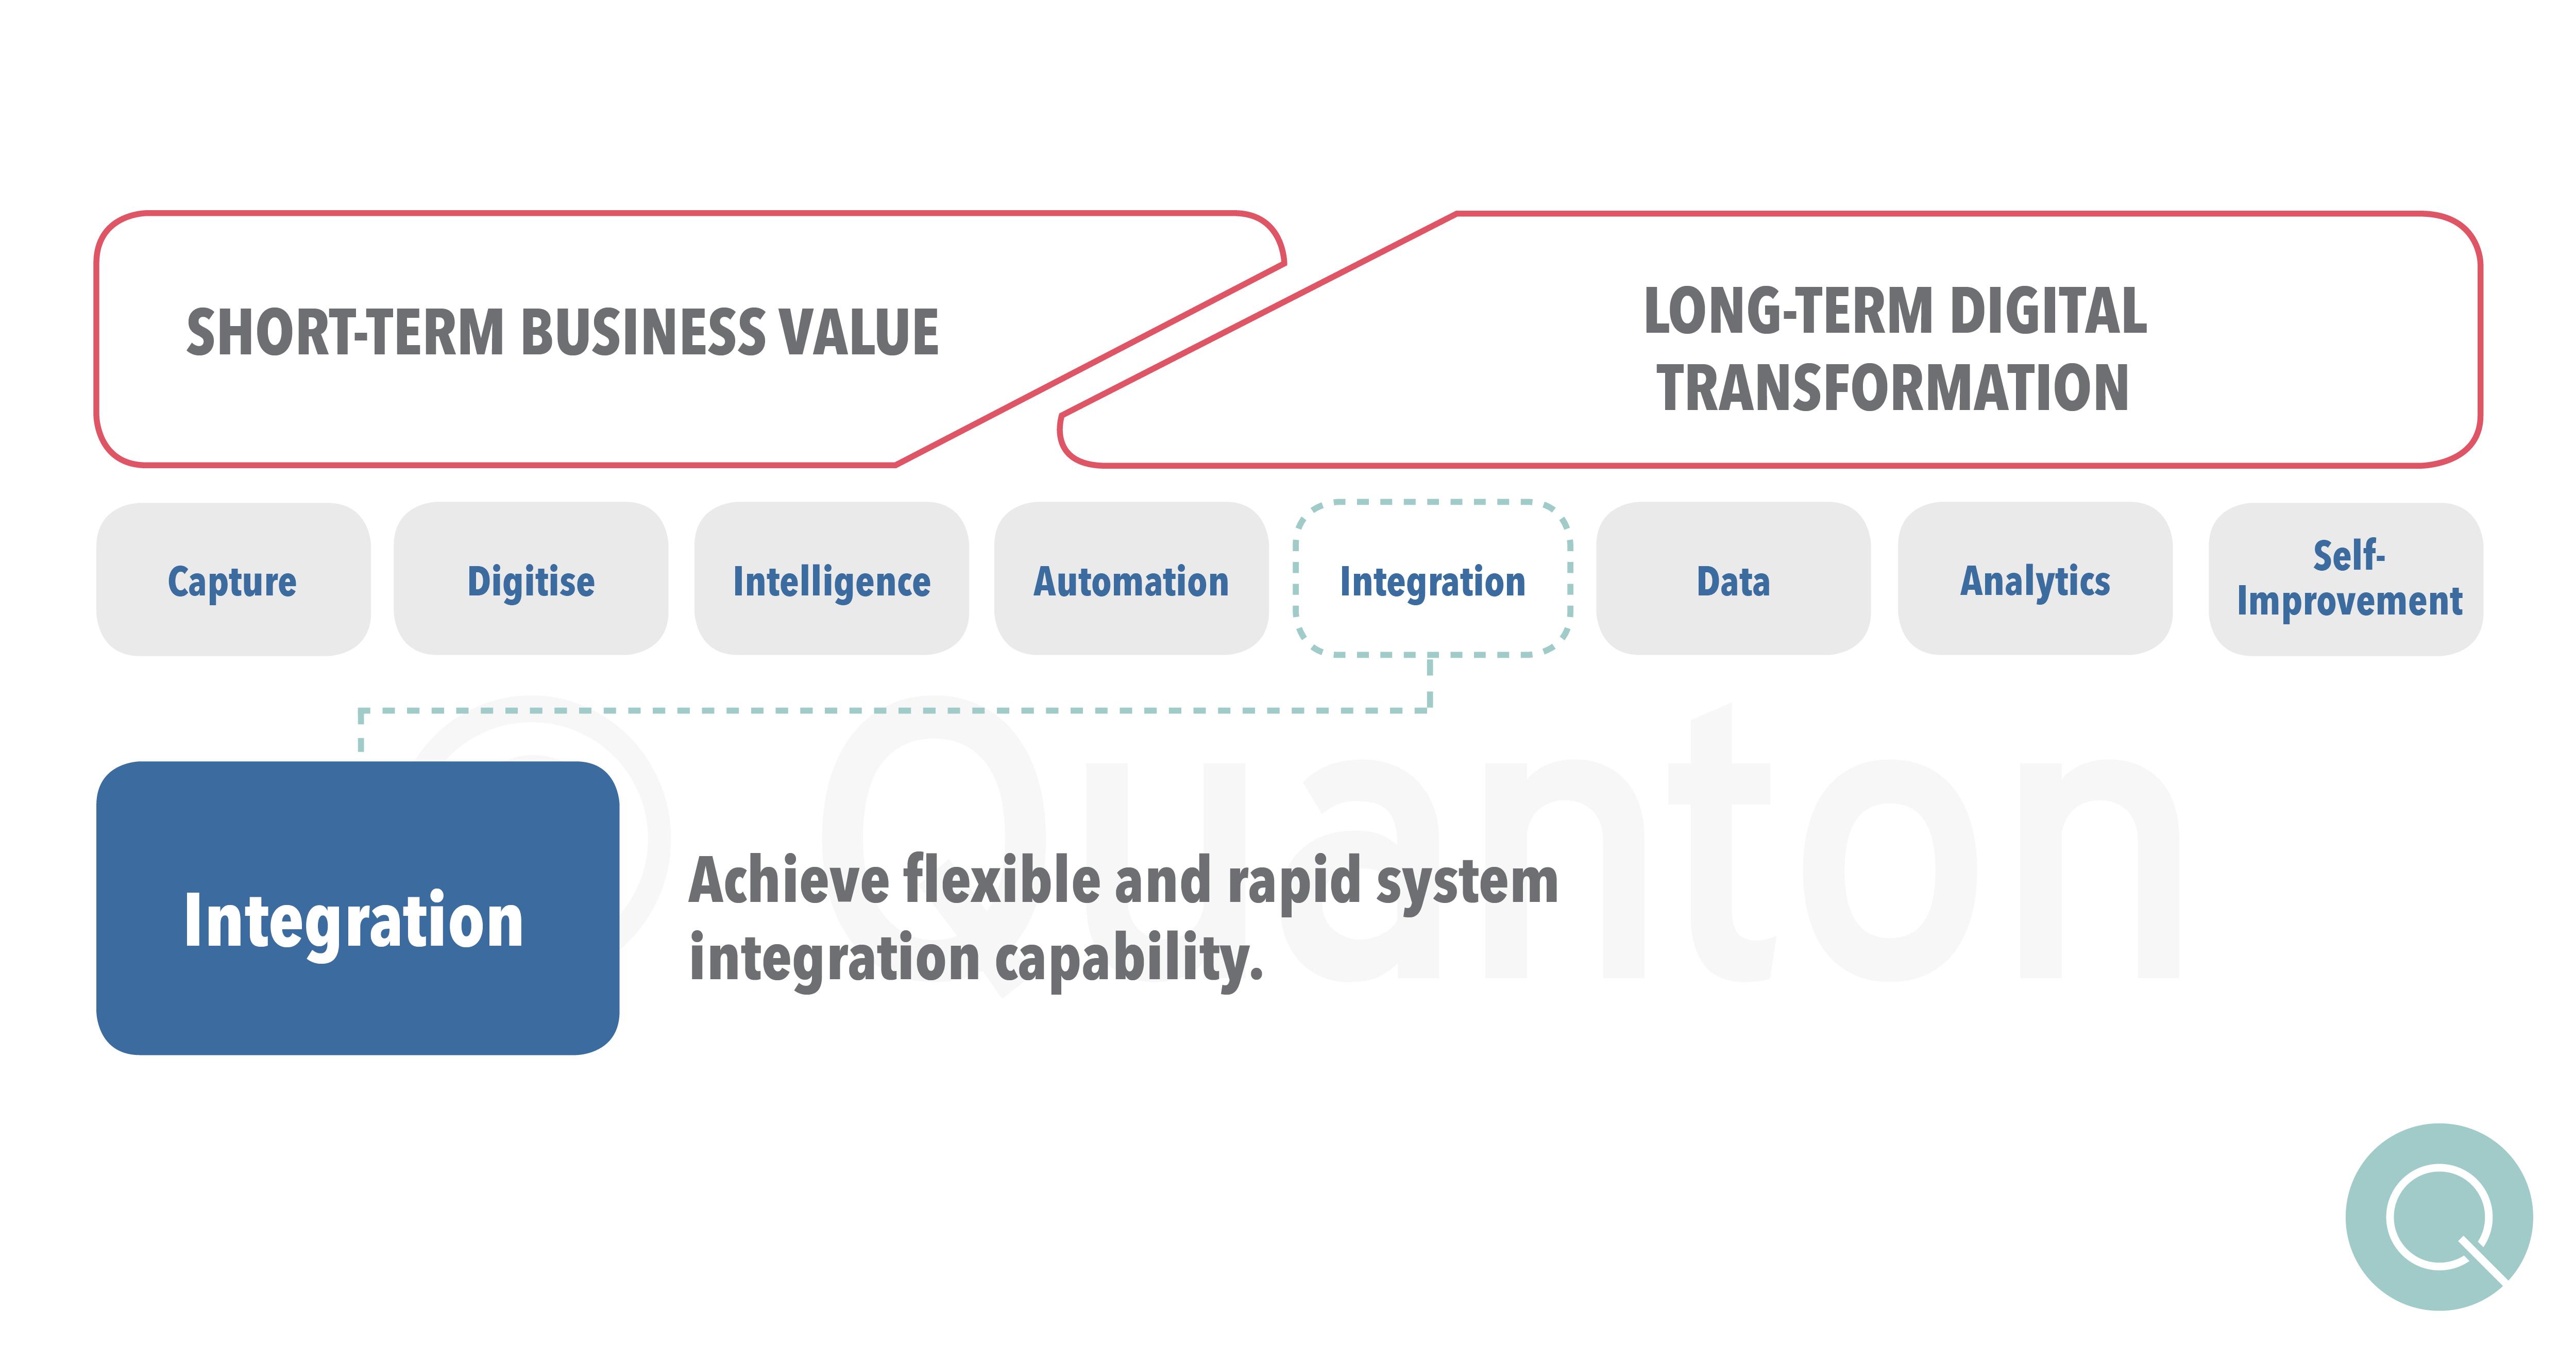 Quanton 8 Technology Enablers for Digital Transformation - Integration